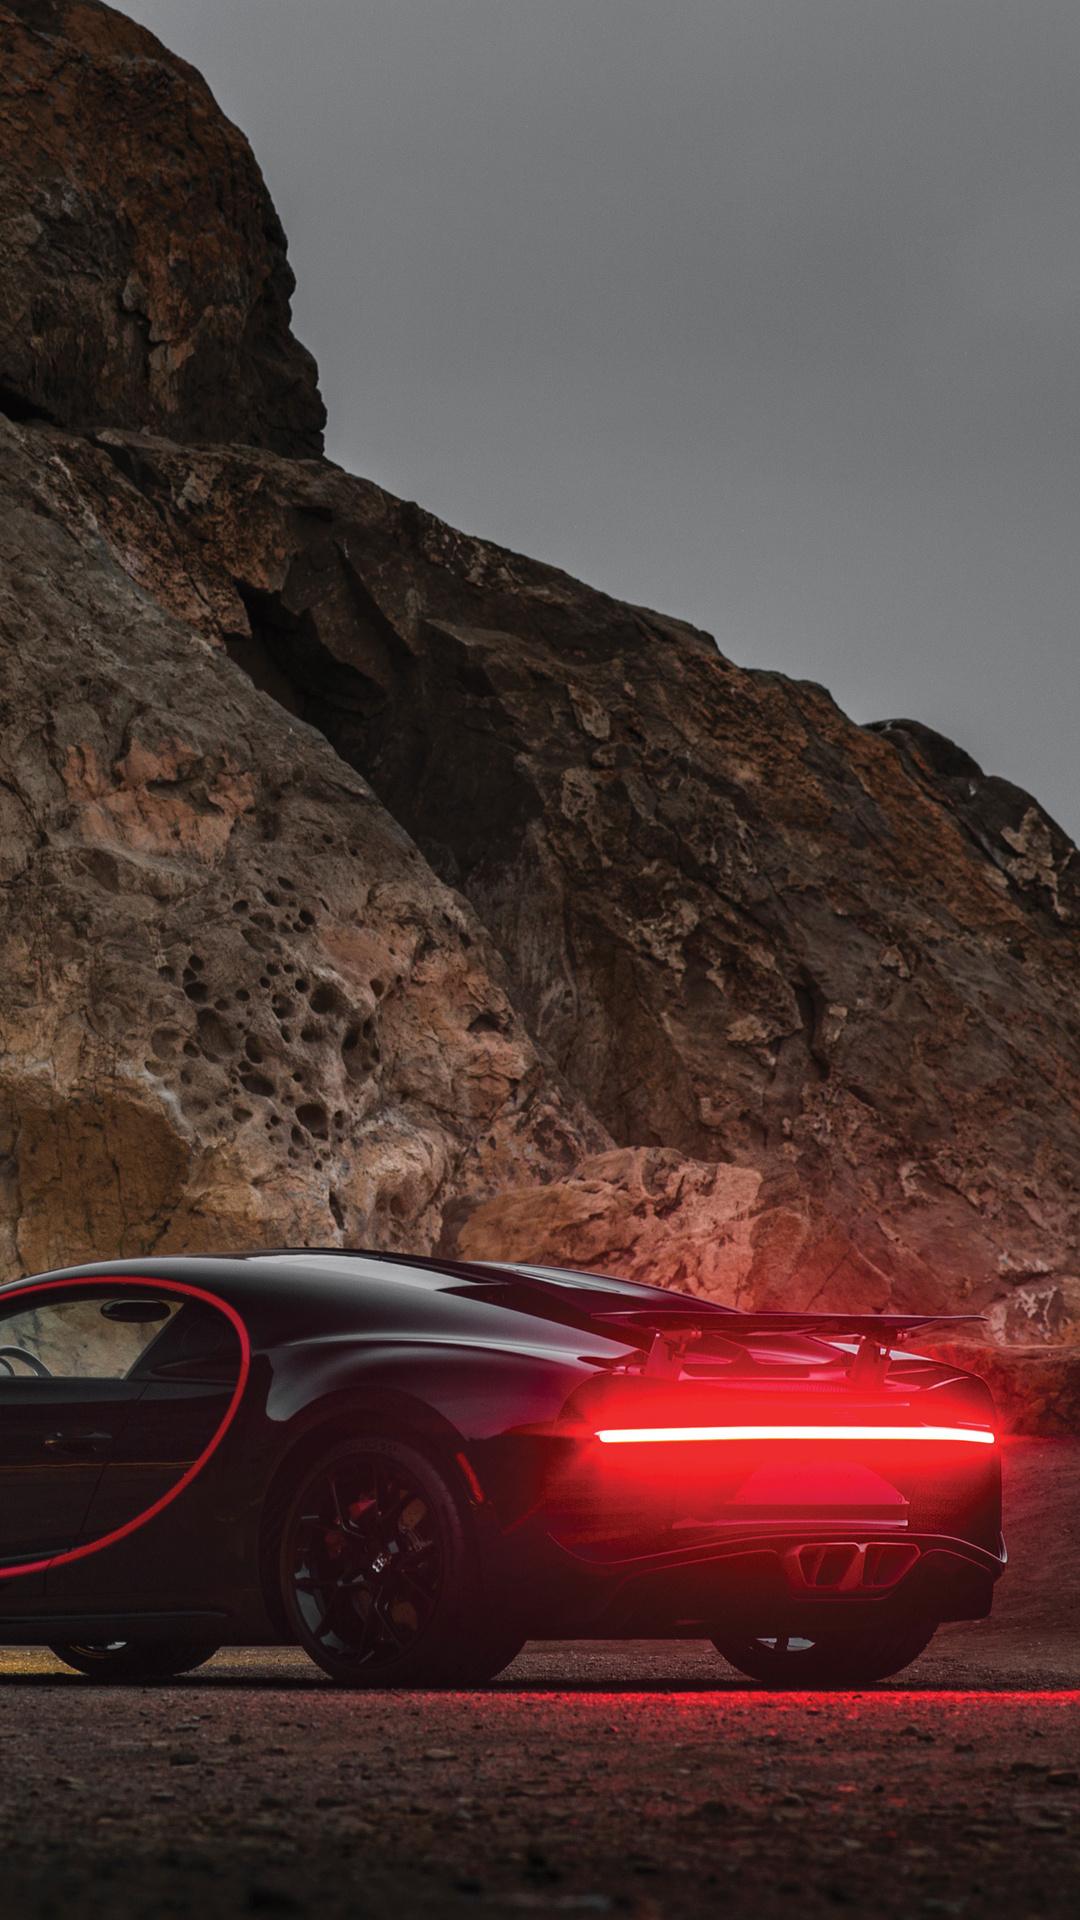 1080x1920 Bugatti Chiron Fastest Car Iphone 7,6s,6 Plus ...